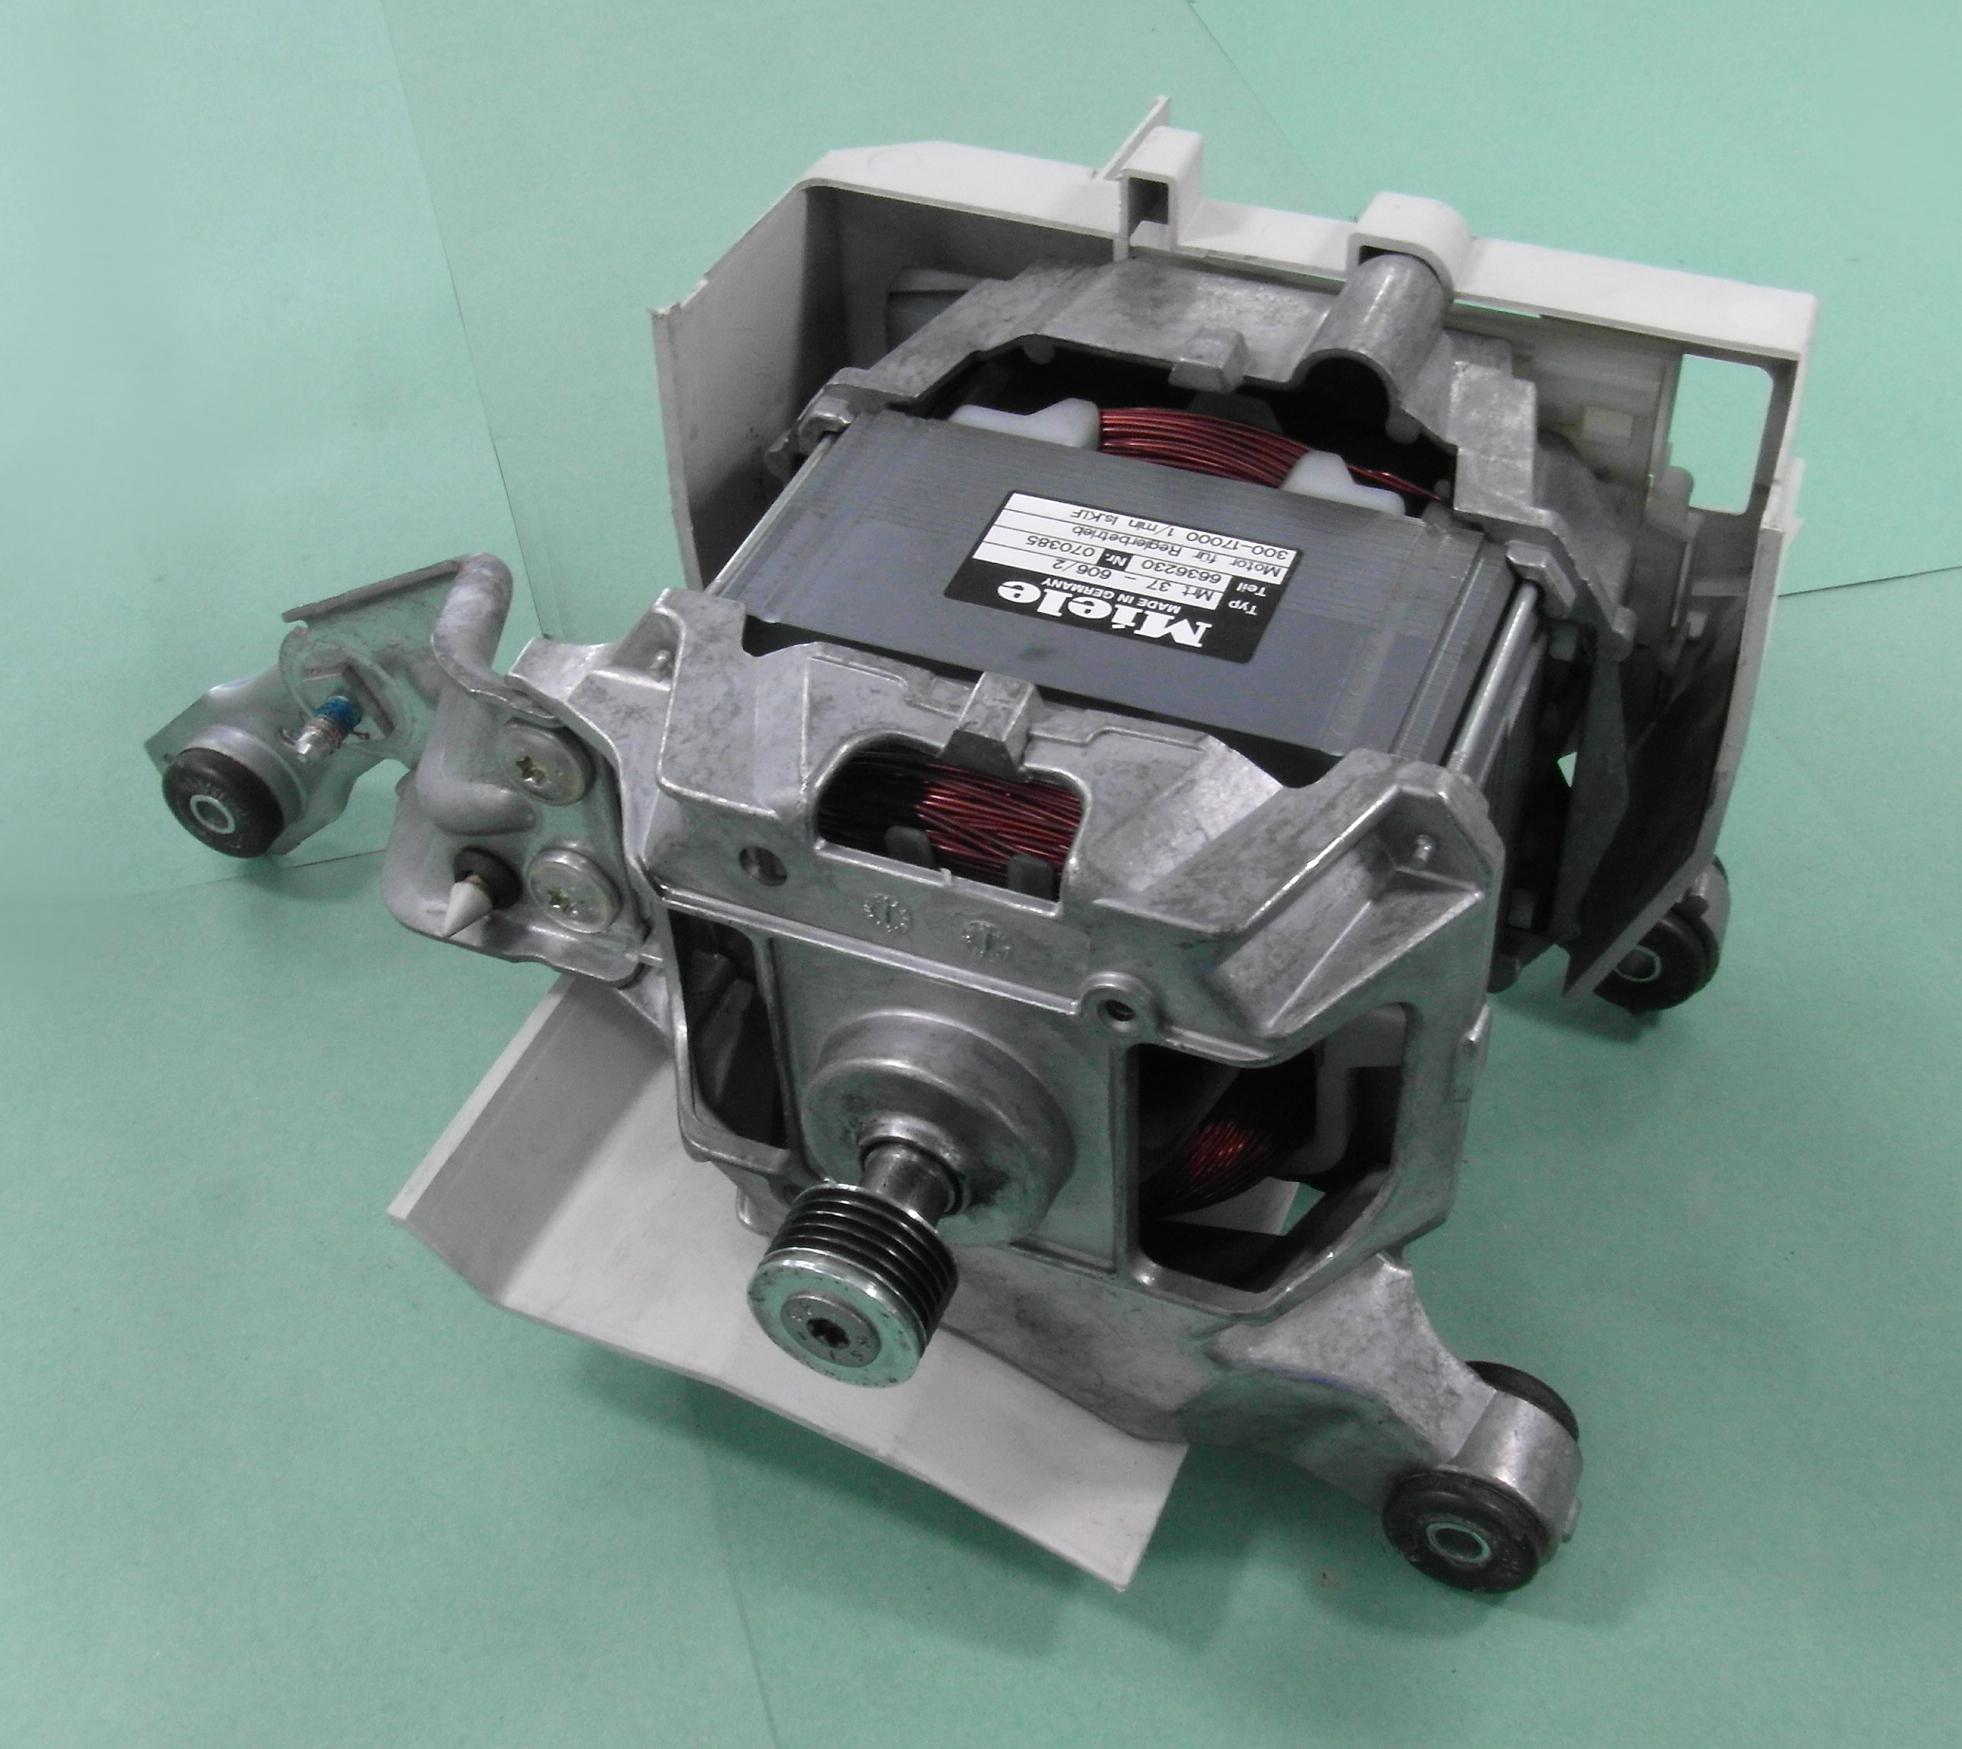 Miele W522 Premier 520 Washing Machine Motor Mrt 37 606 2